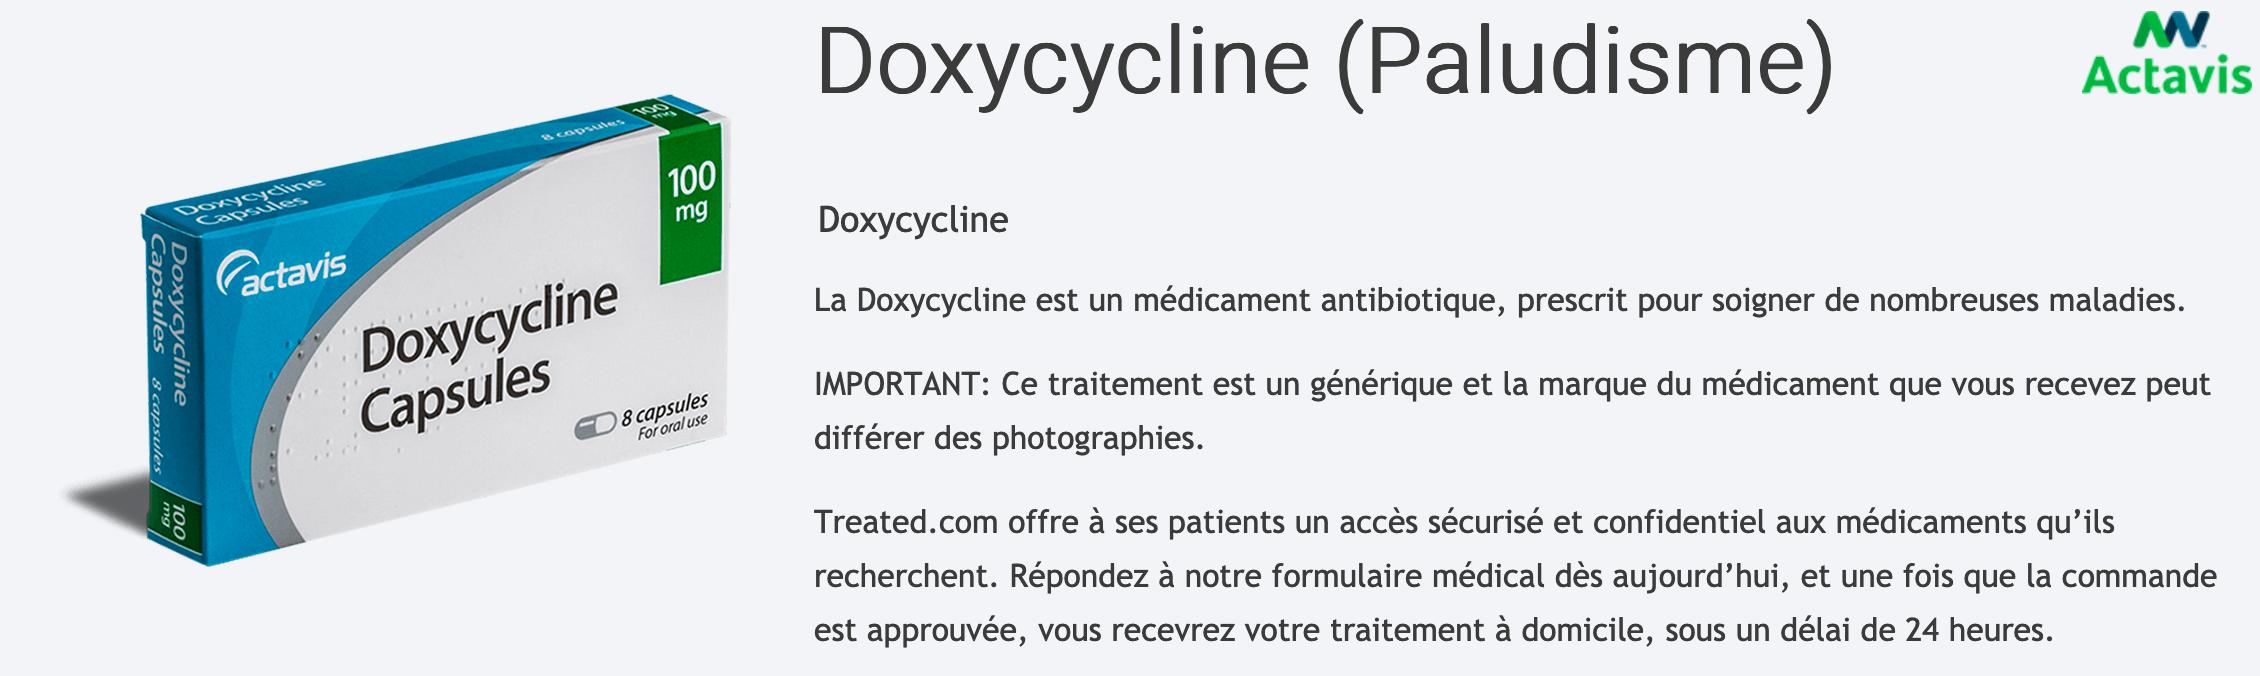 Doxycycline-Paludisme